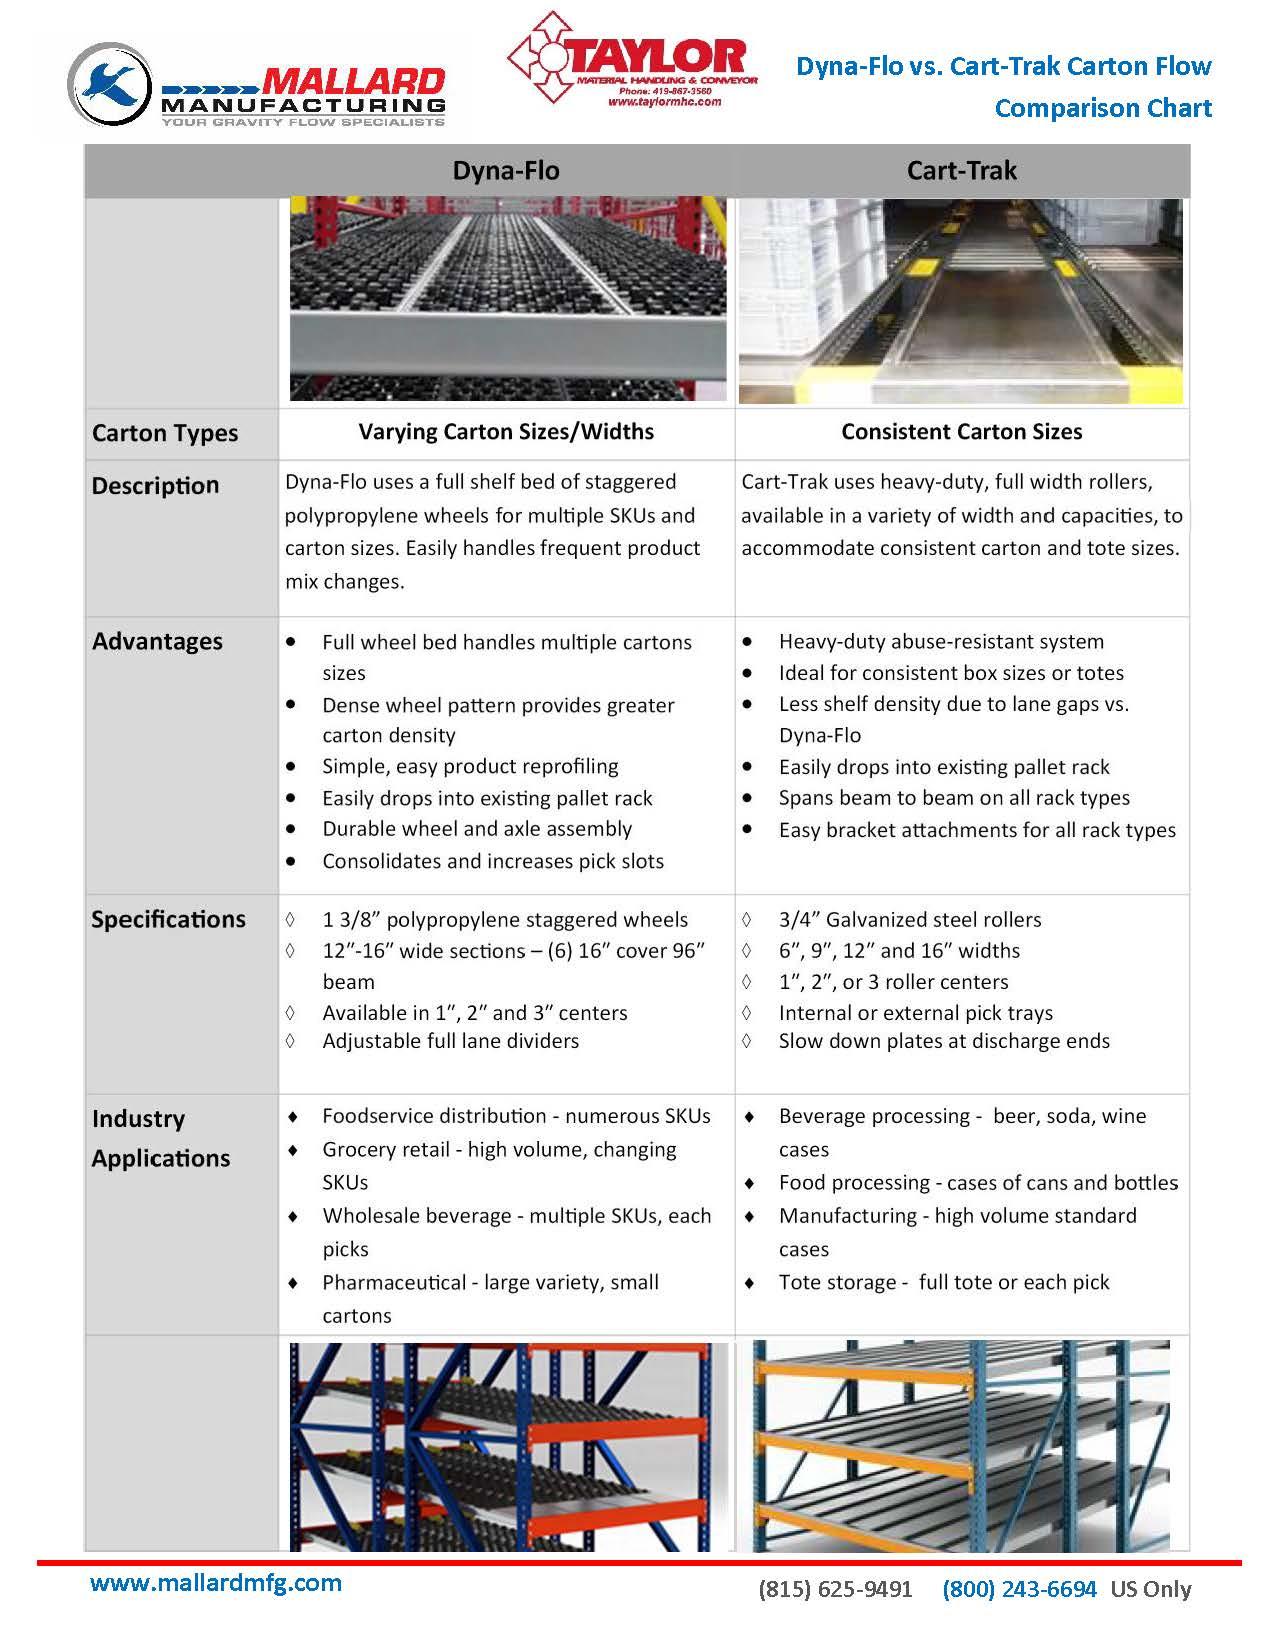 Mallard Pallet Flow Comparison Sheet